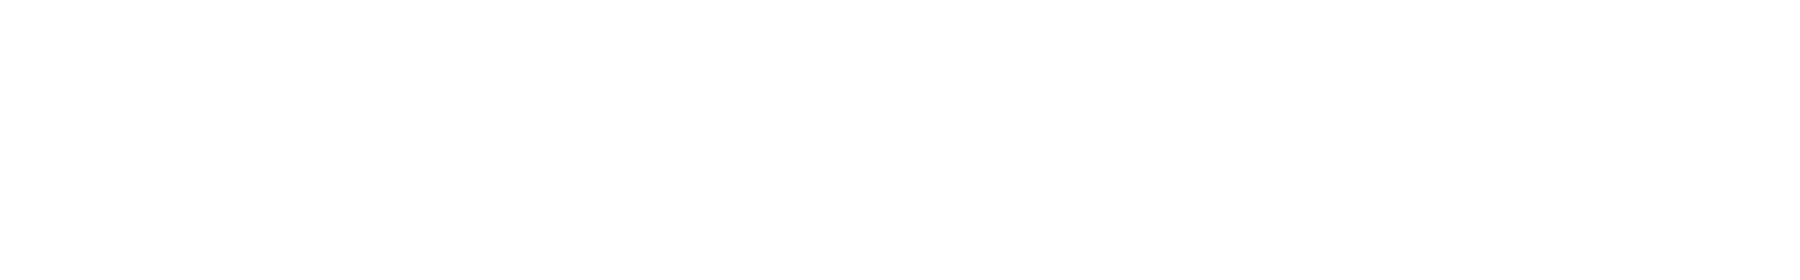 crux 85 d